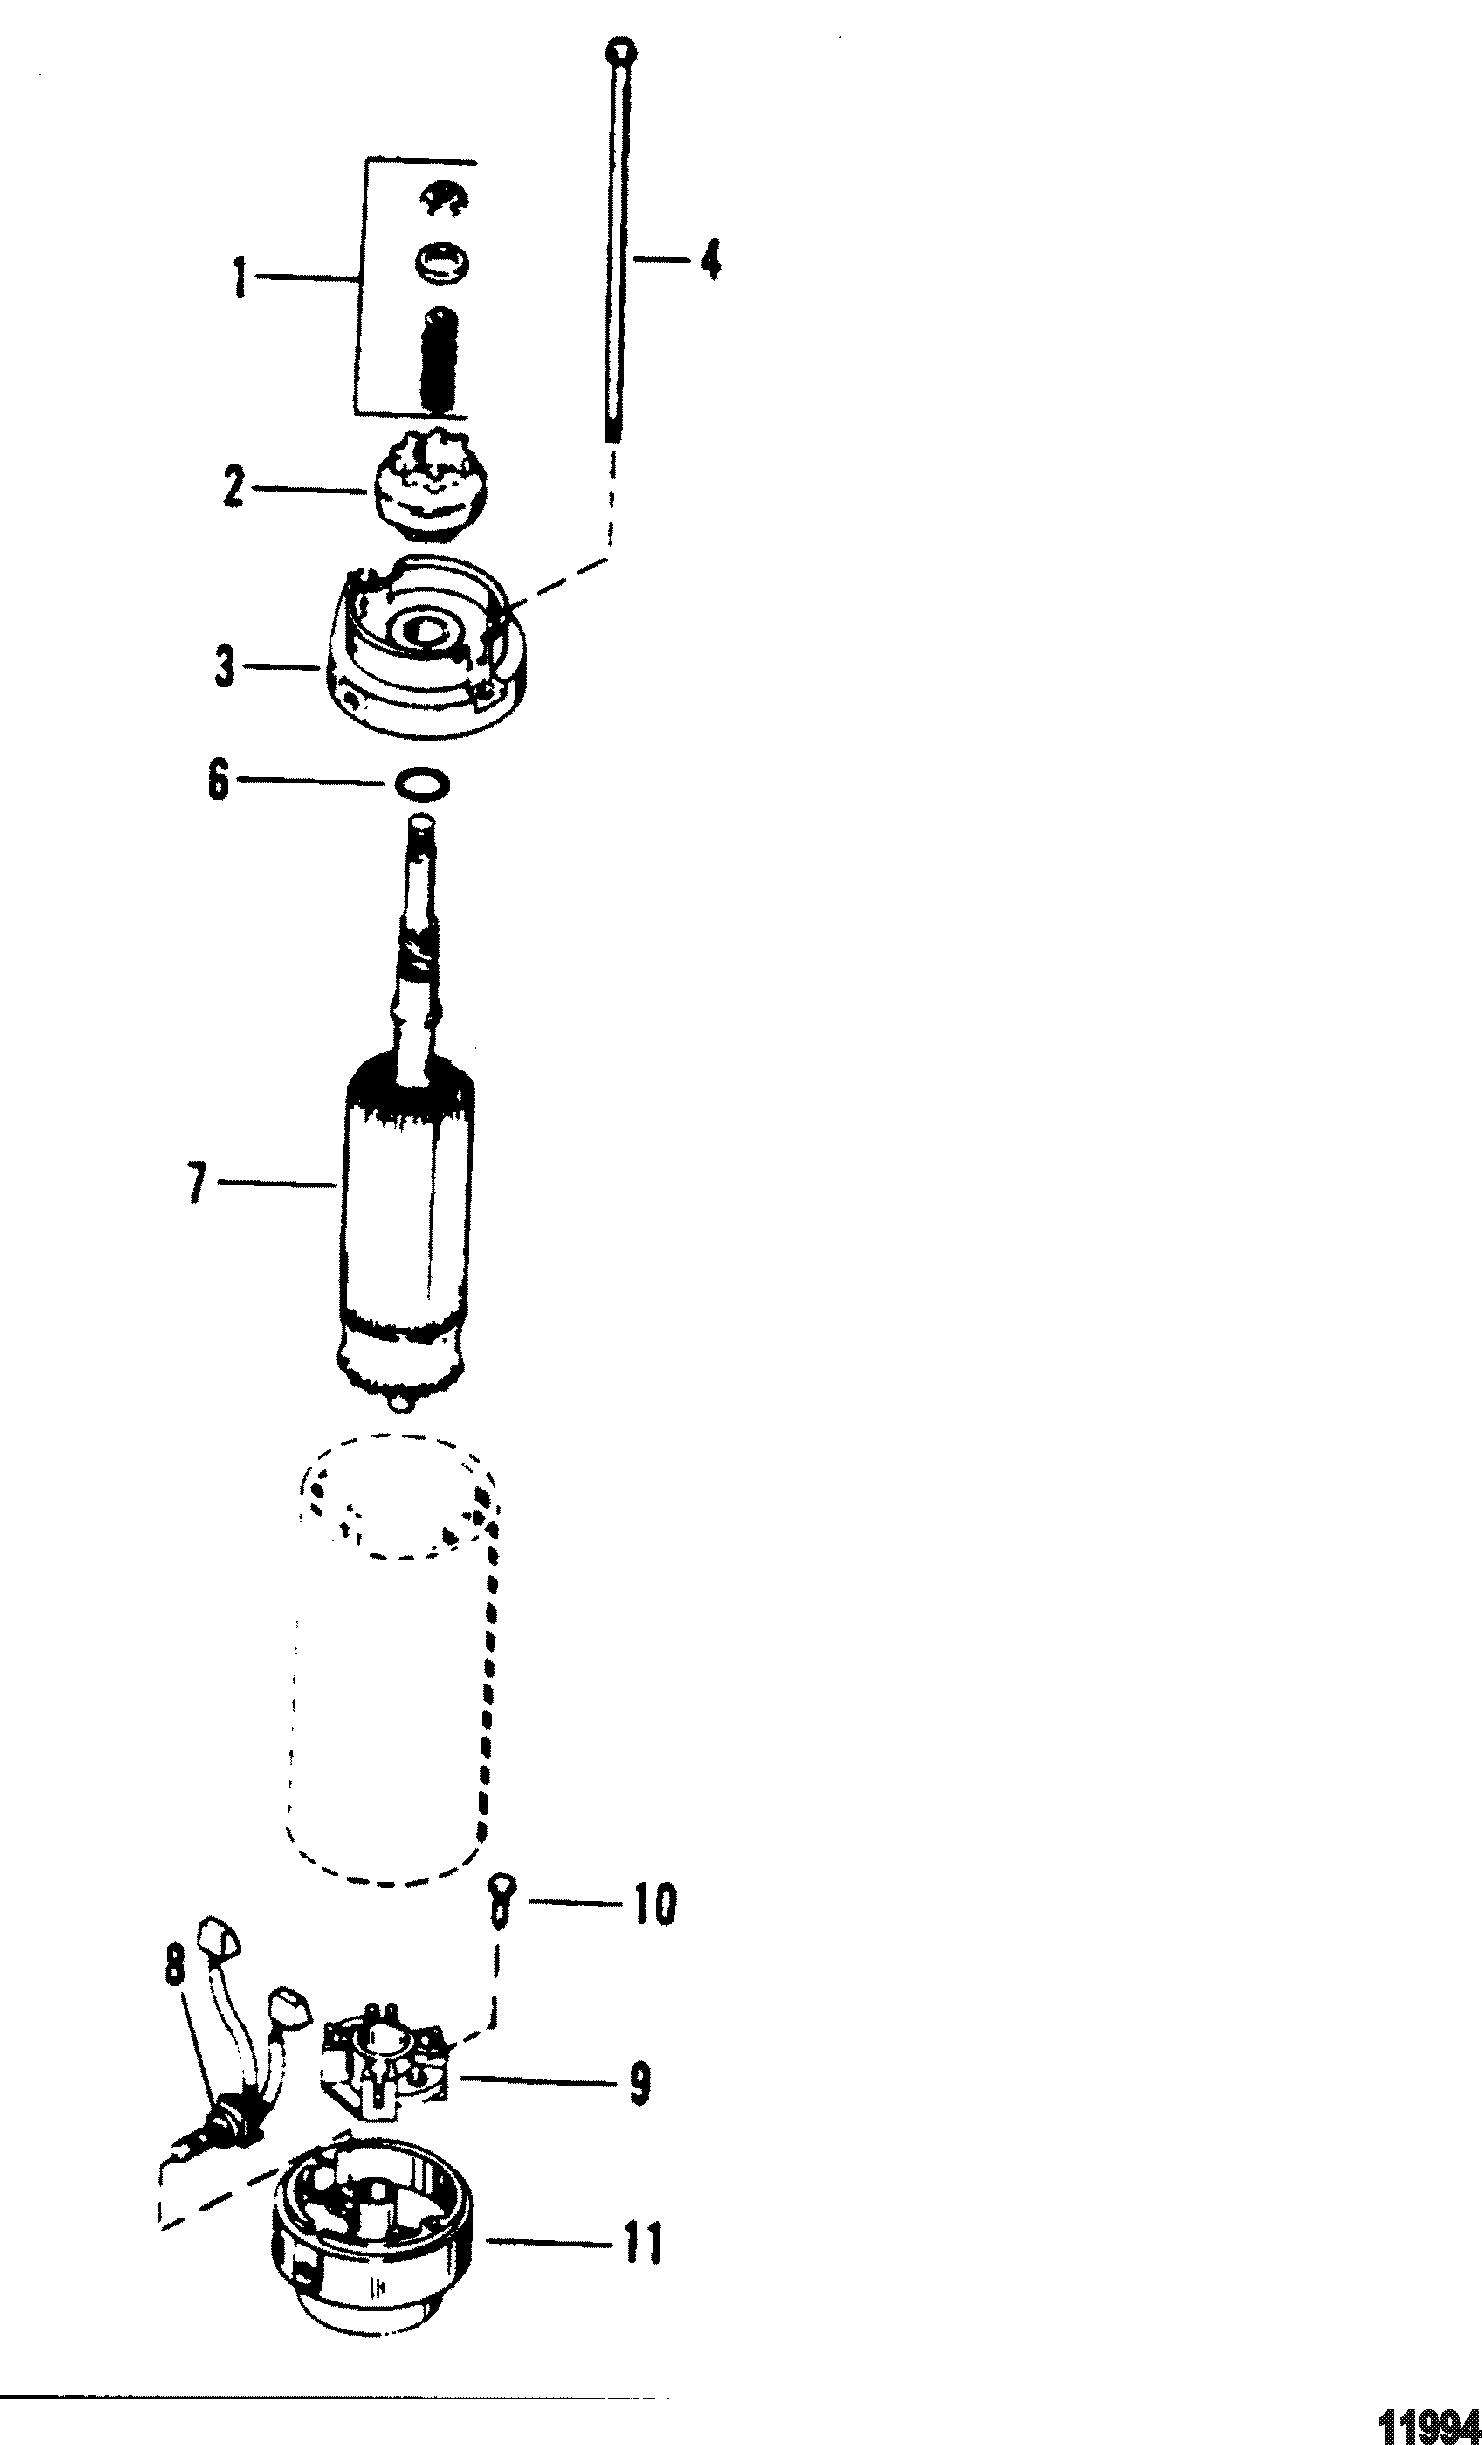 40 hp 4 cyl mariner wiring diagram 40 get free image about wiring diagram